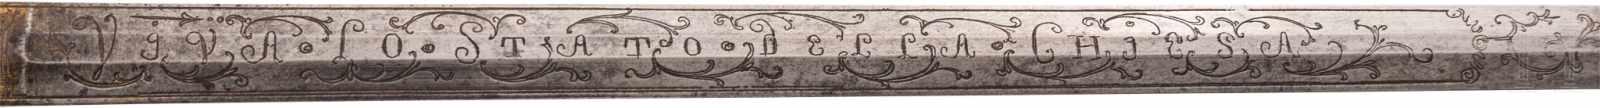 Lot 4409 - Silbermontierter, vergoldeter Offiziersdegen der vatikanischen Garde, 2. Hälfte 18. Jhdt.